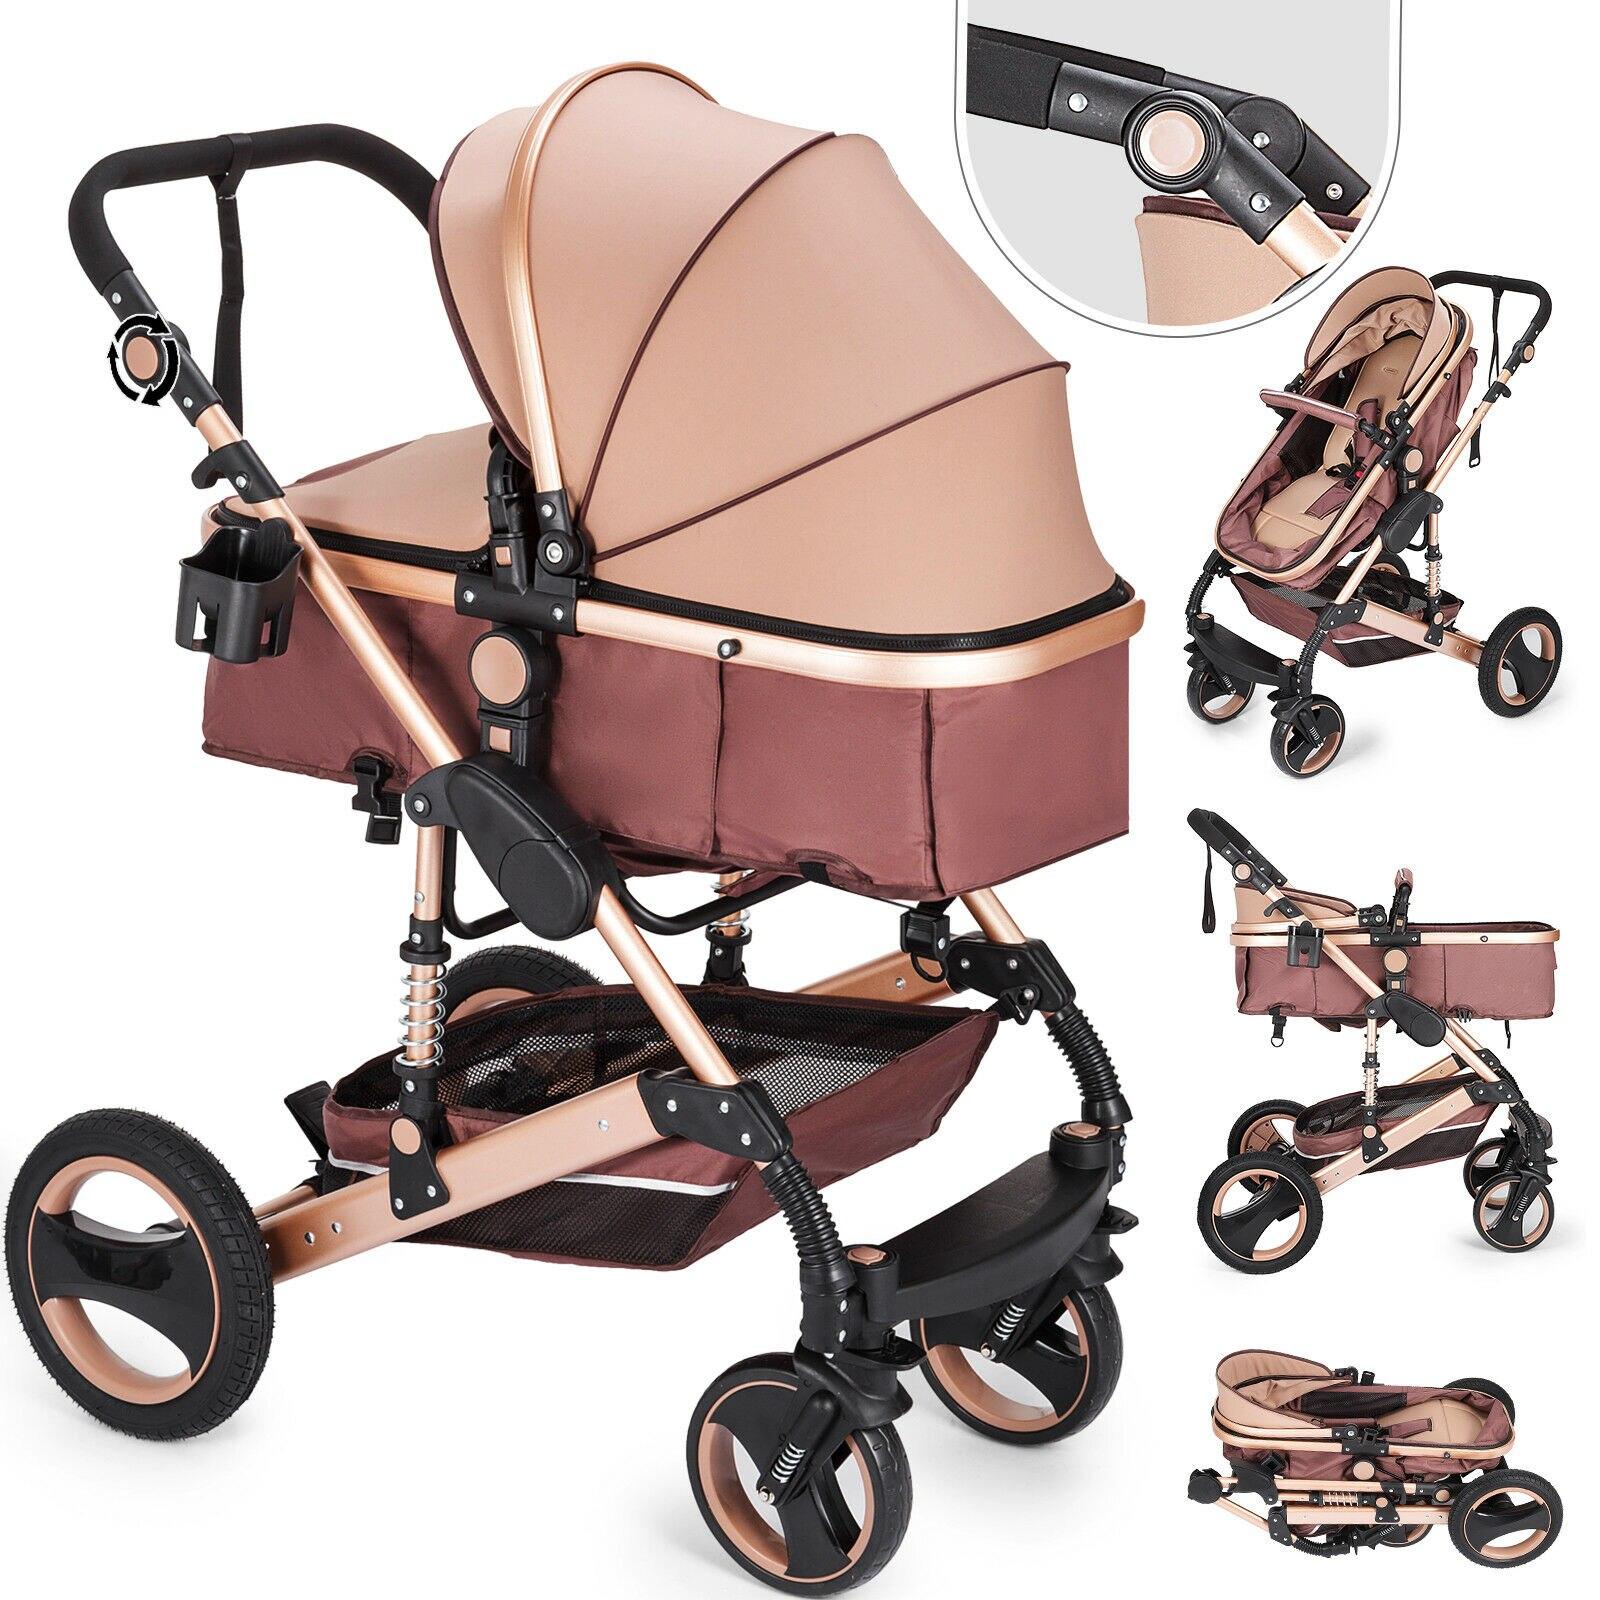 Luxury Stroller ALU 2in1 Baby Car Seat Baby Bath Sports Seat Baby